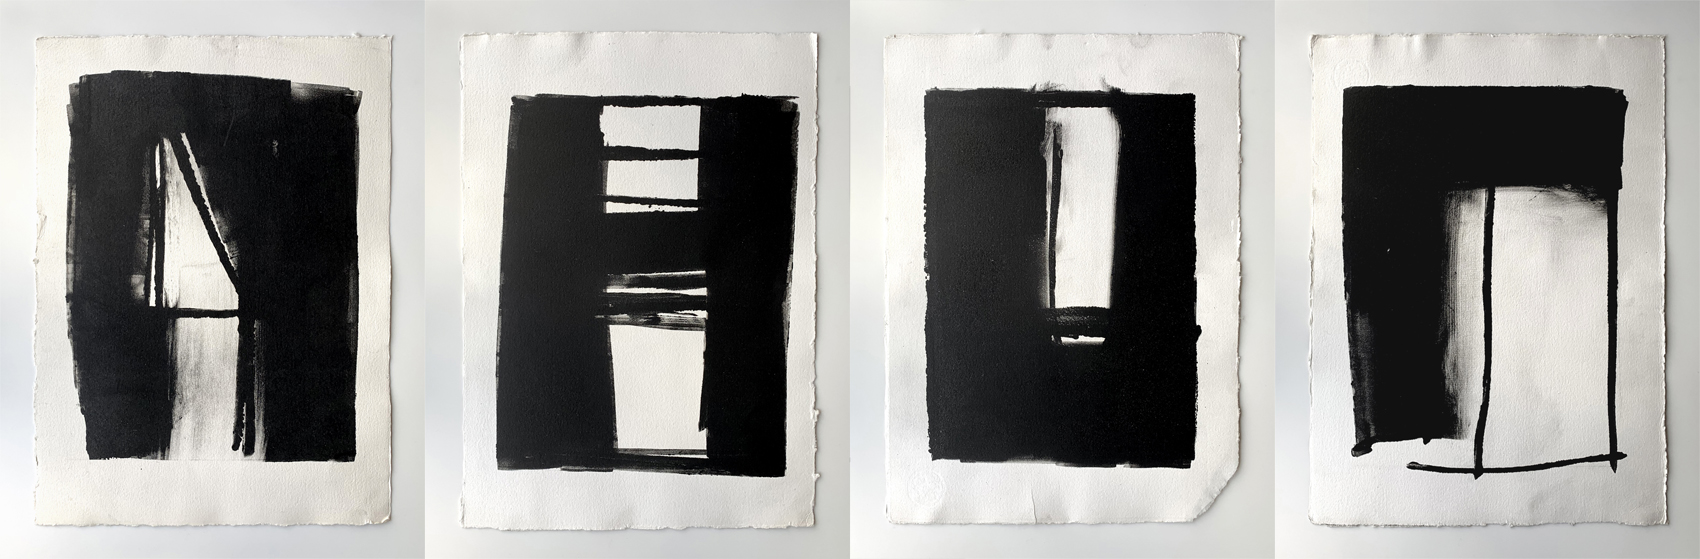 4 x Prints 1990